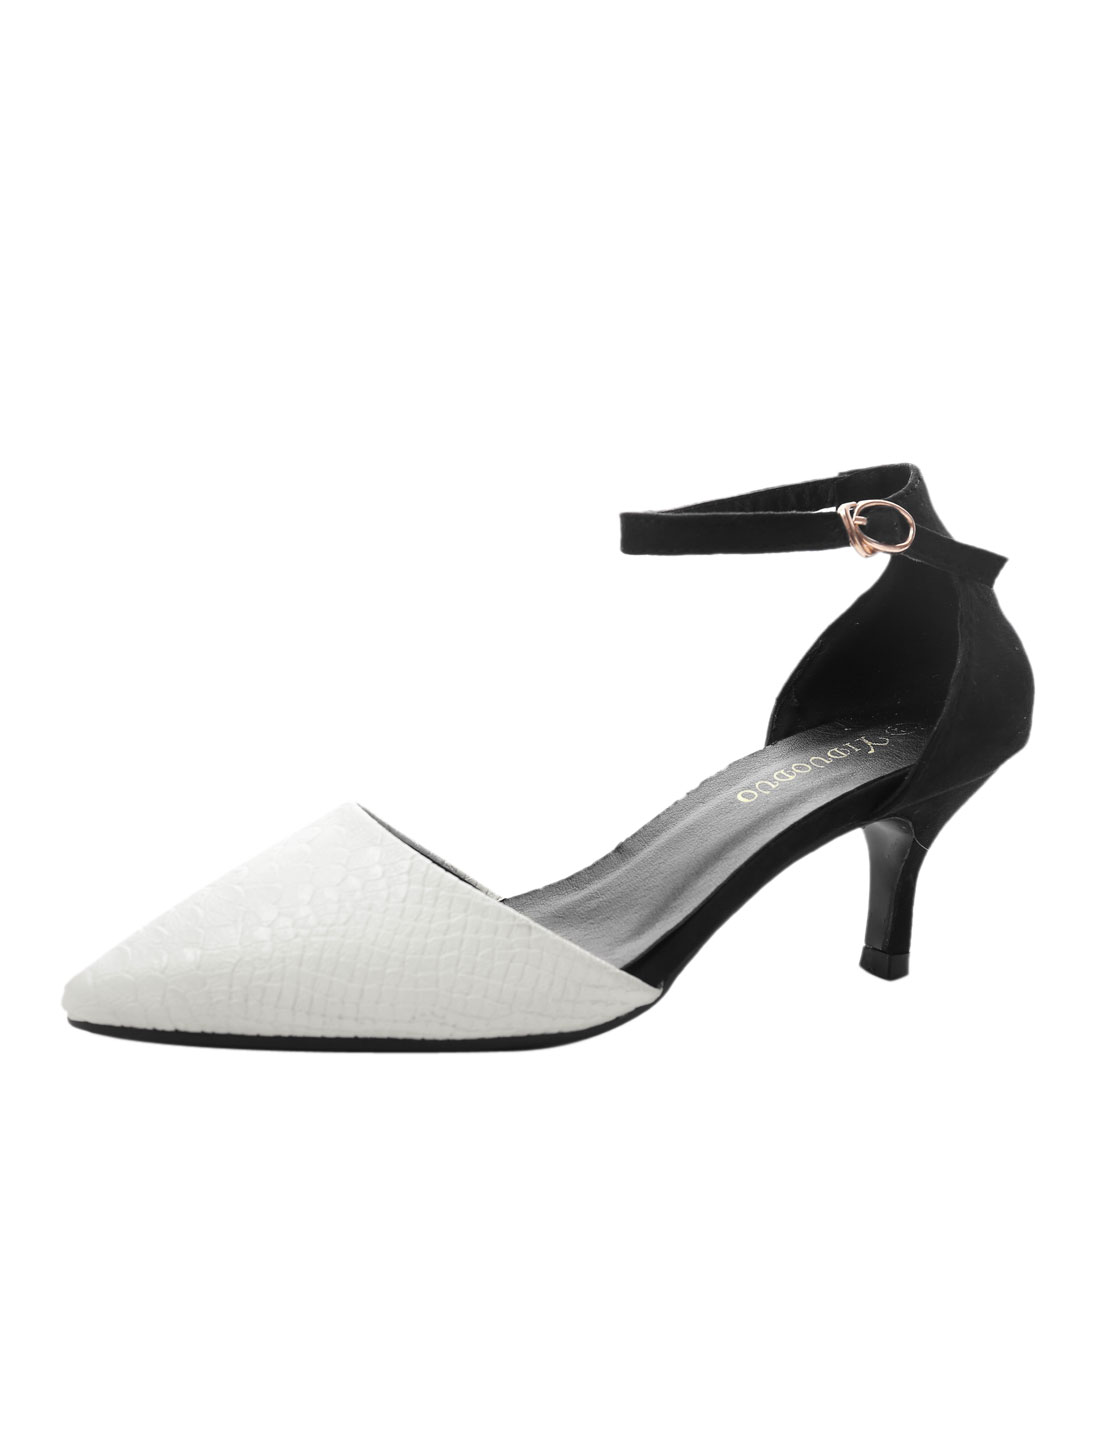 Lady Point Toe Faux Leather Panel Kitten Heels White US 7.5